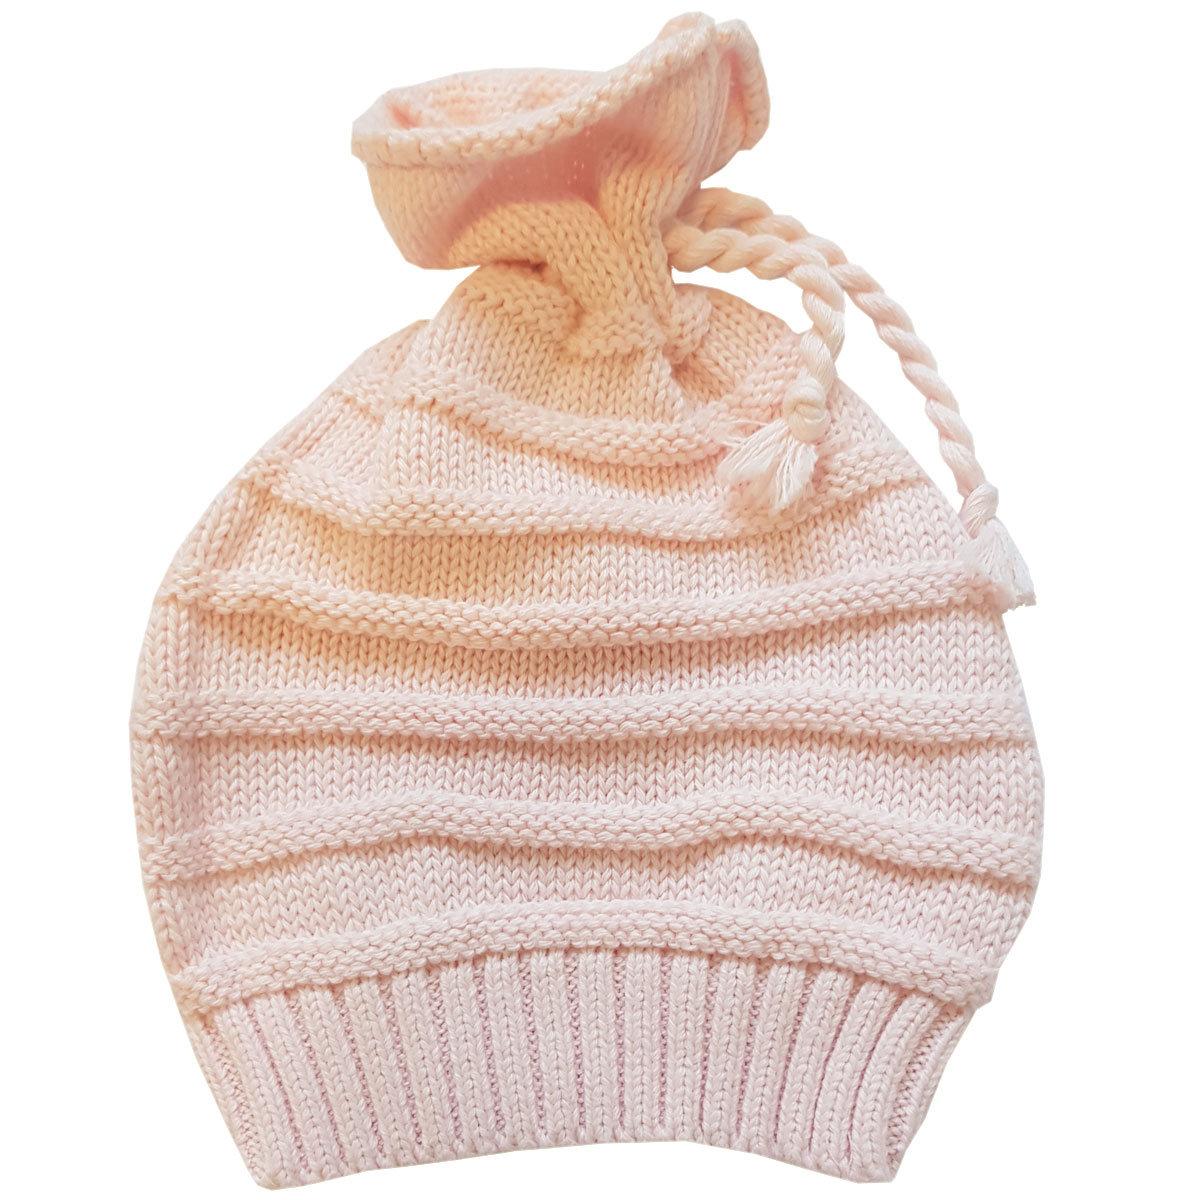 Шапочка для девочки Папитто вязаная (цвет: розовый, размер 36-40)